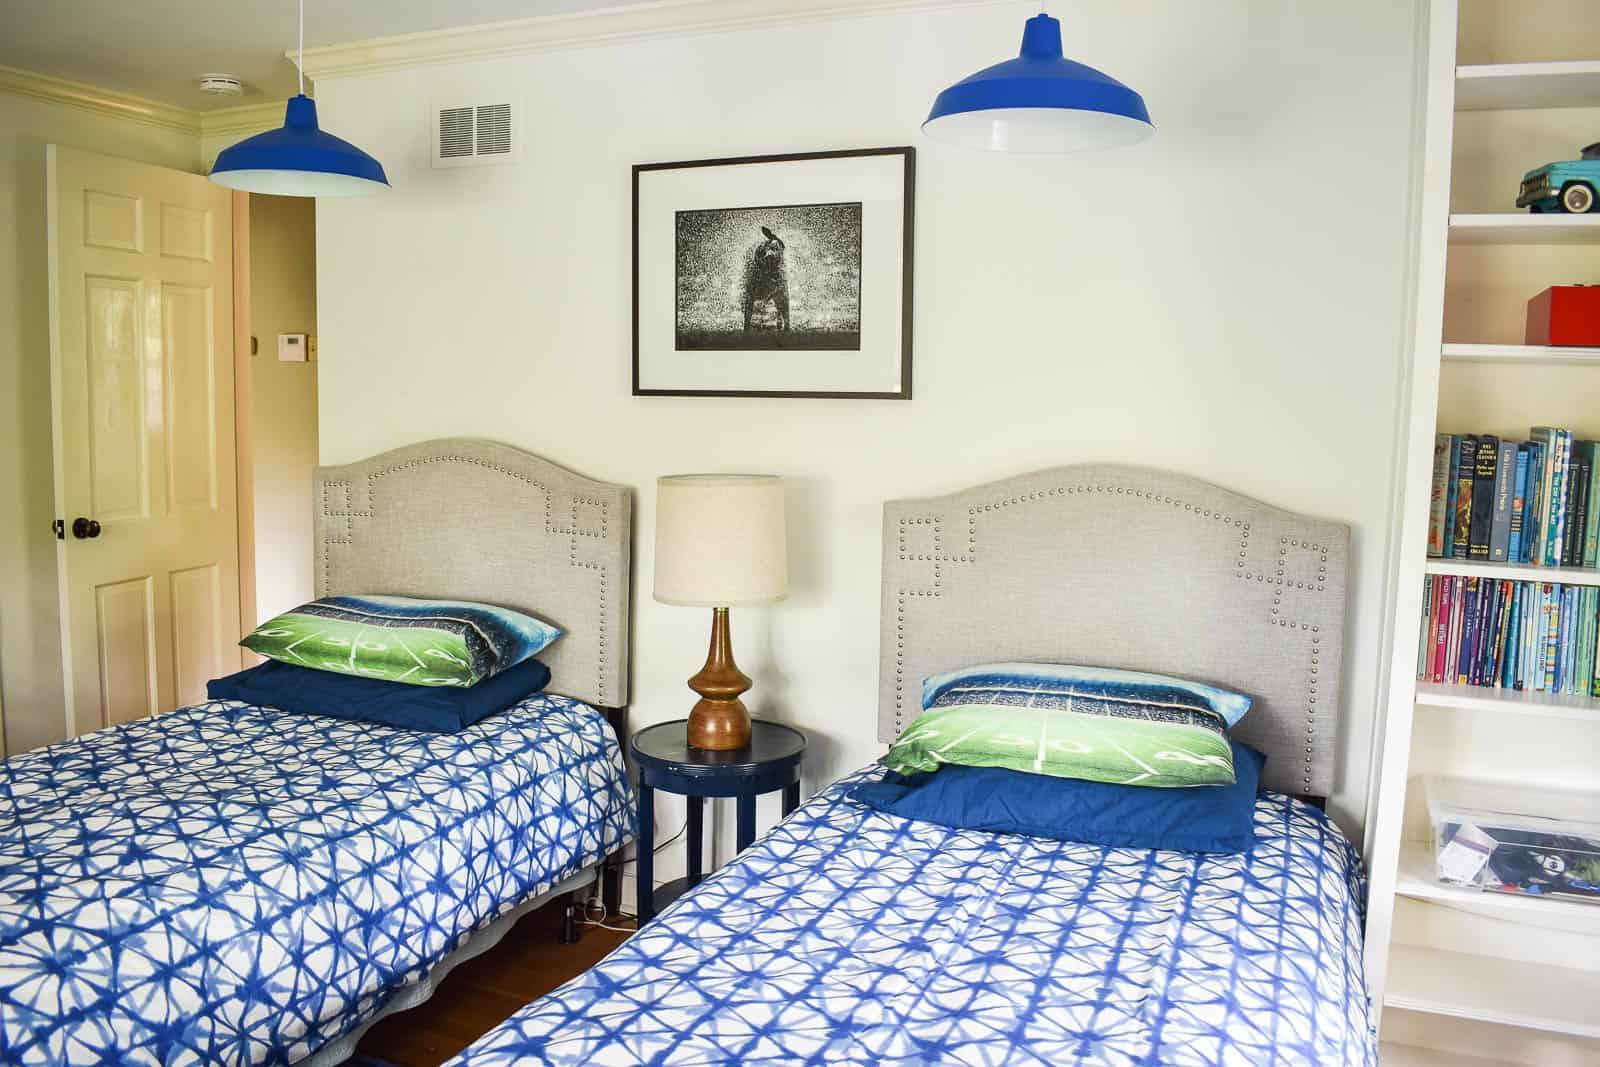 blue bedroom pendant lights using the magic light trick